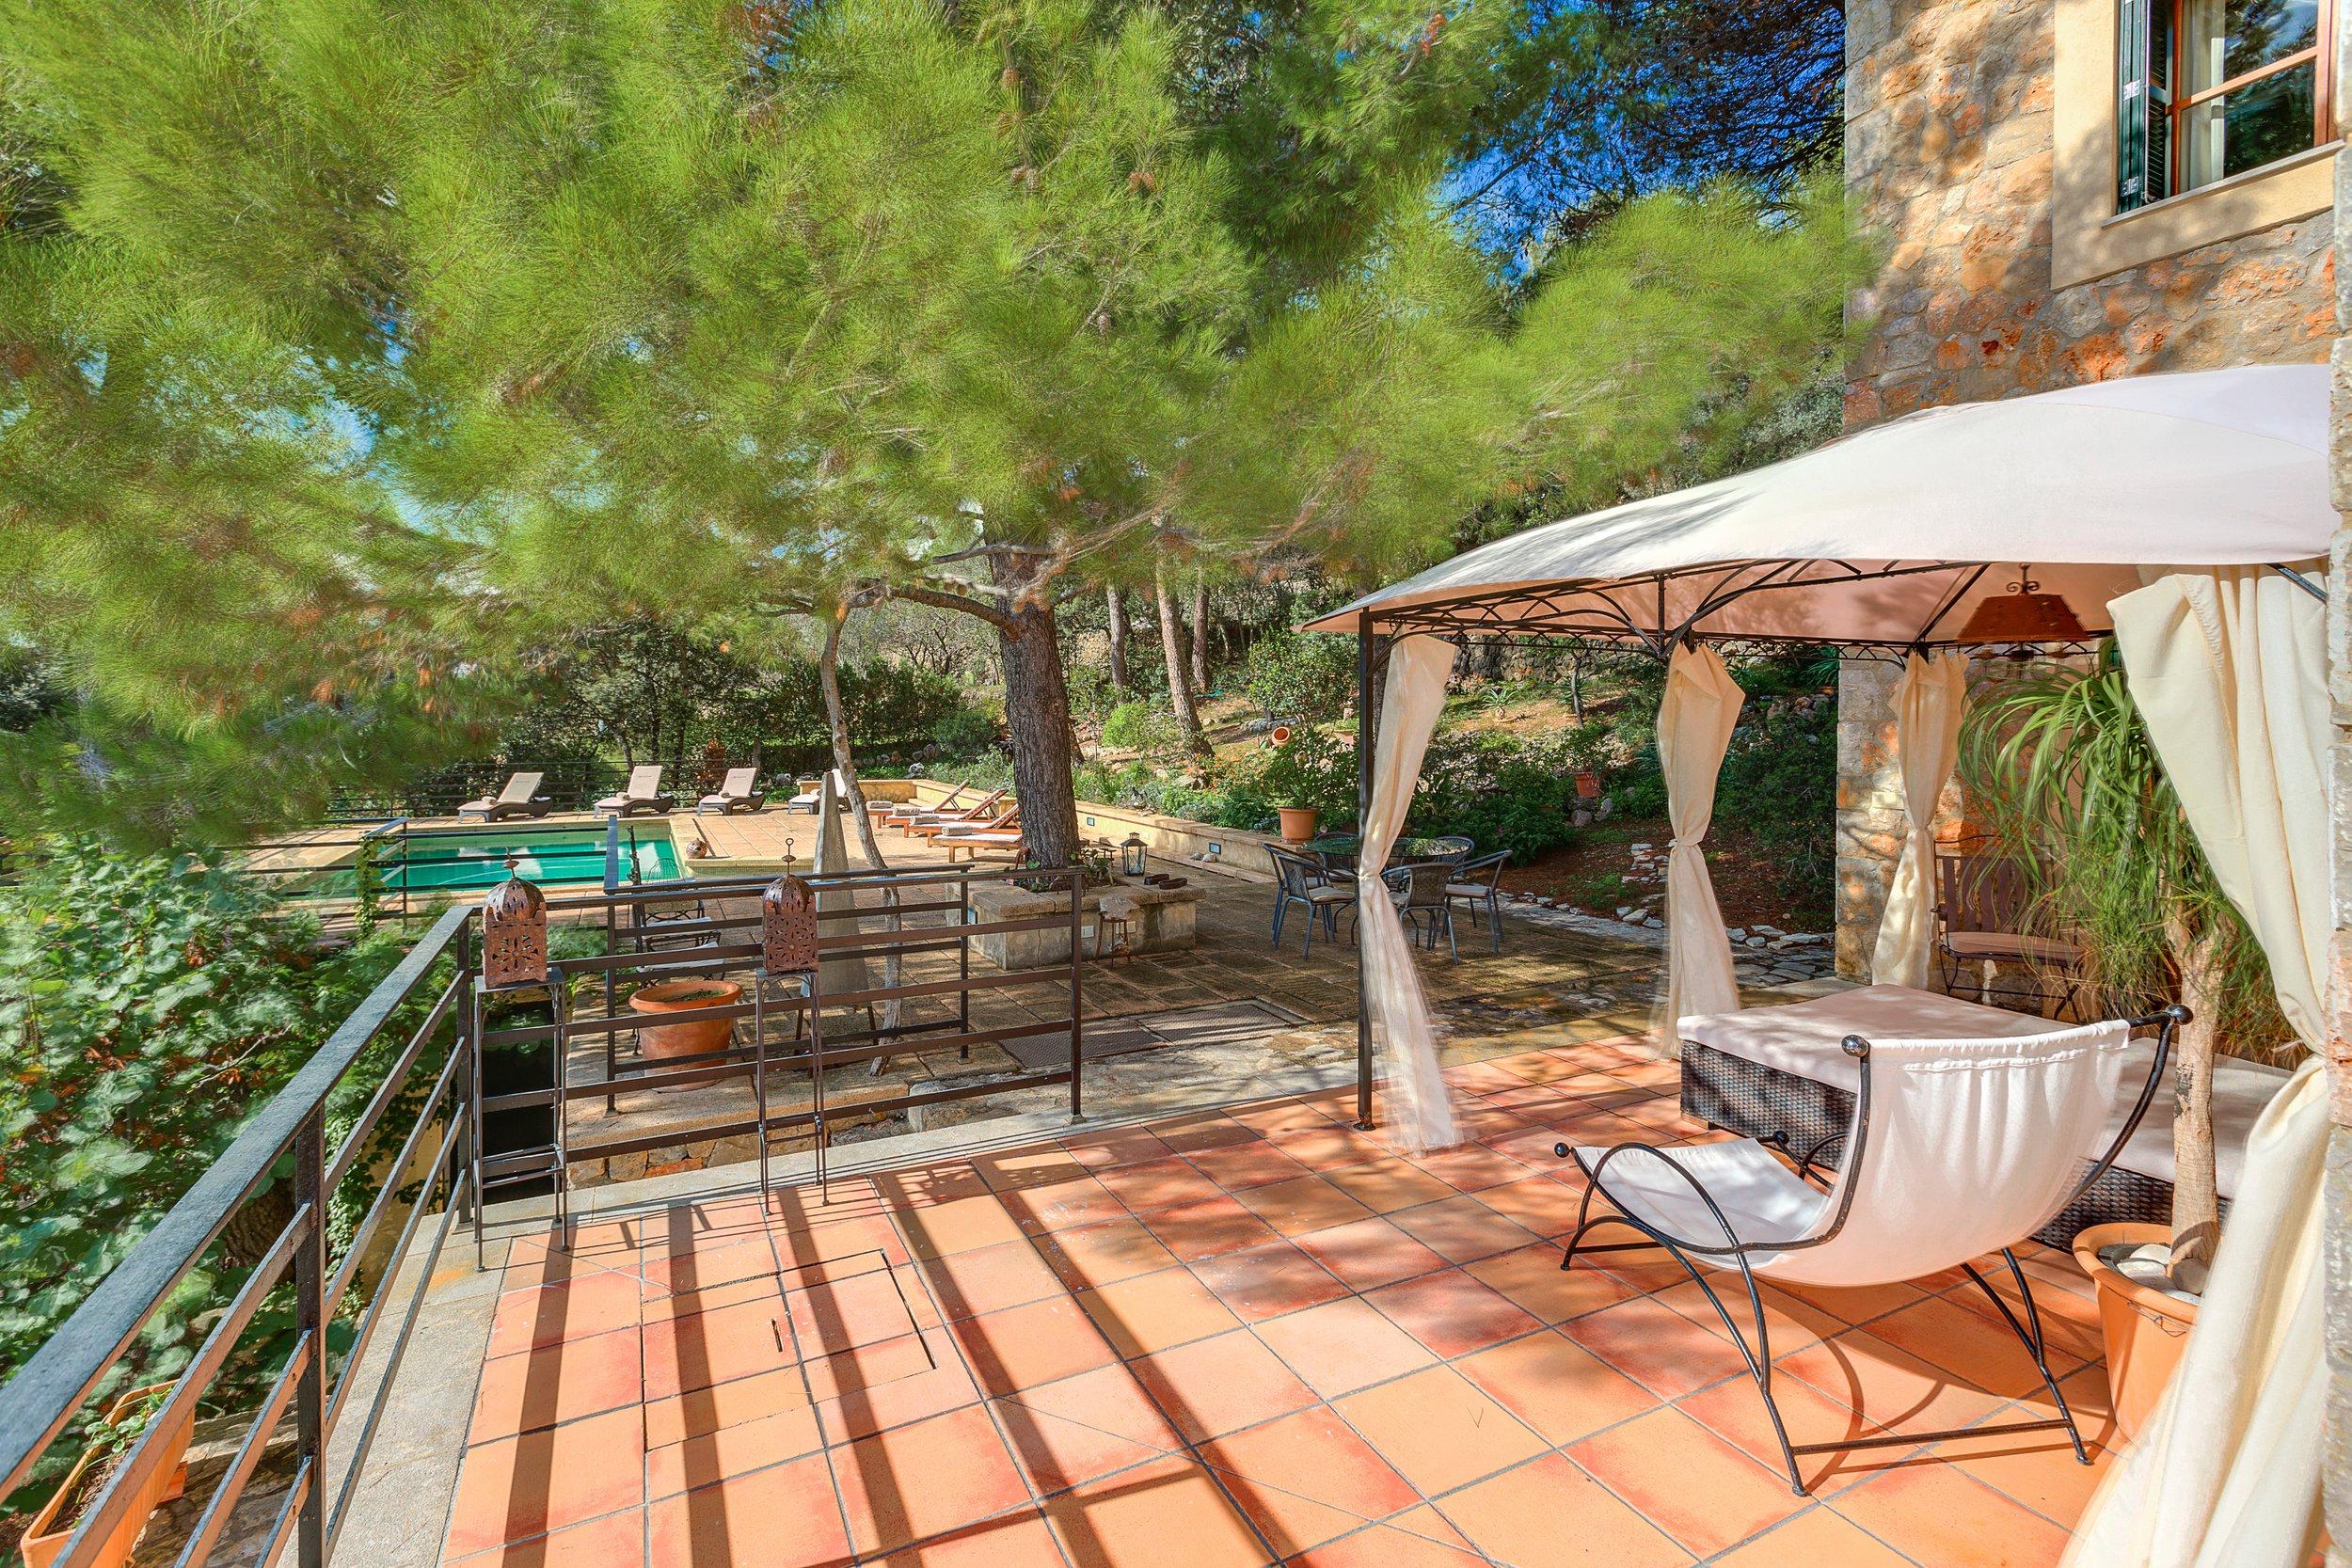 Maison de vacances Villa Cirera in Alaro (2611793), Alaro, Majorque, Iles Baléares, Espagne, image 11